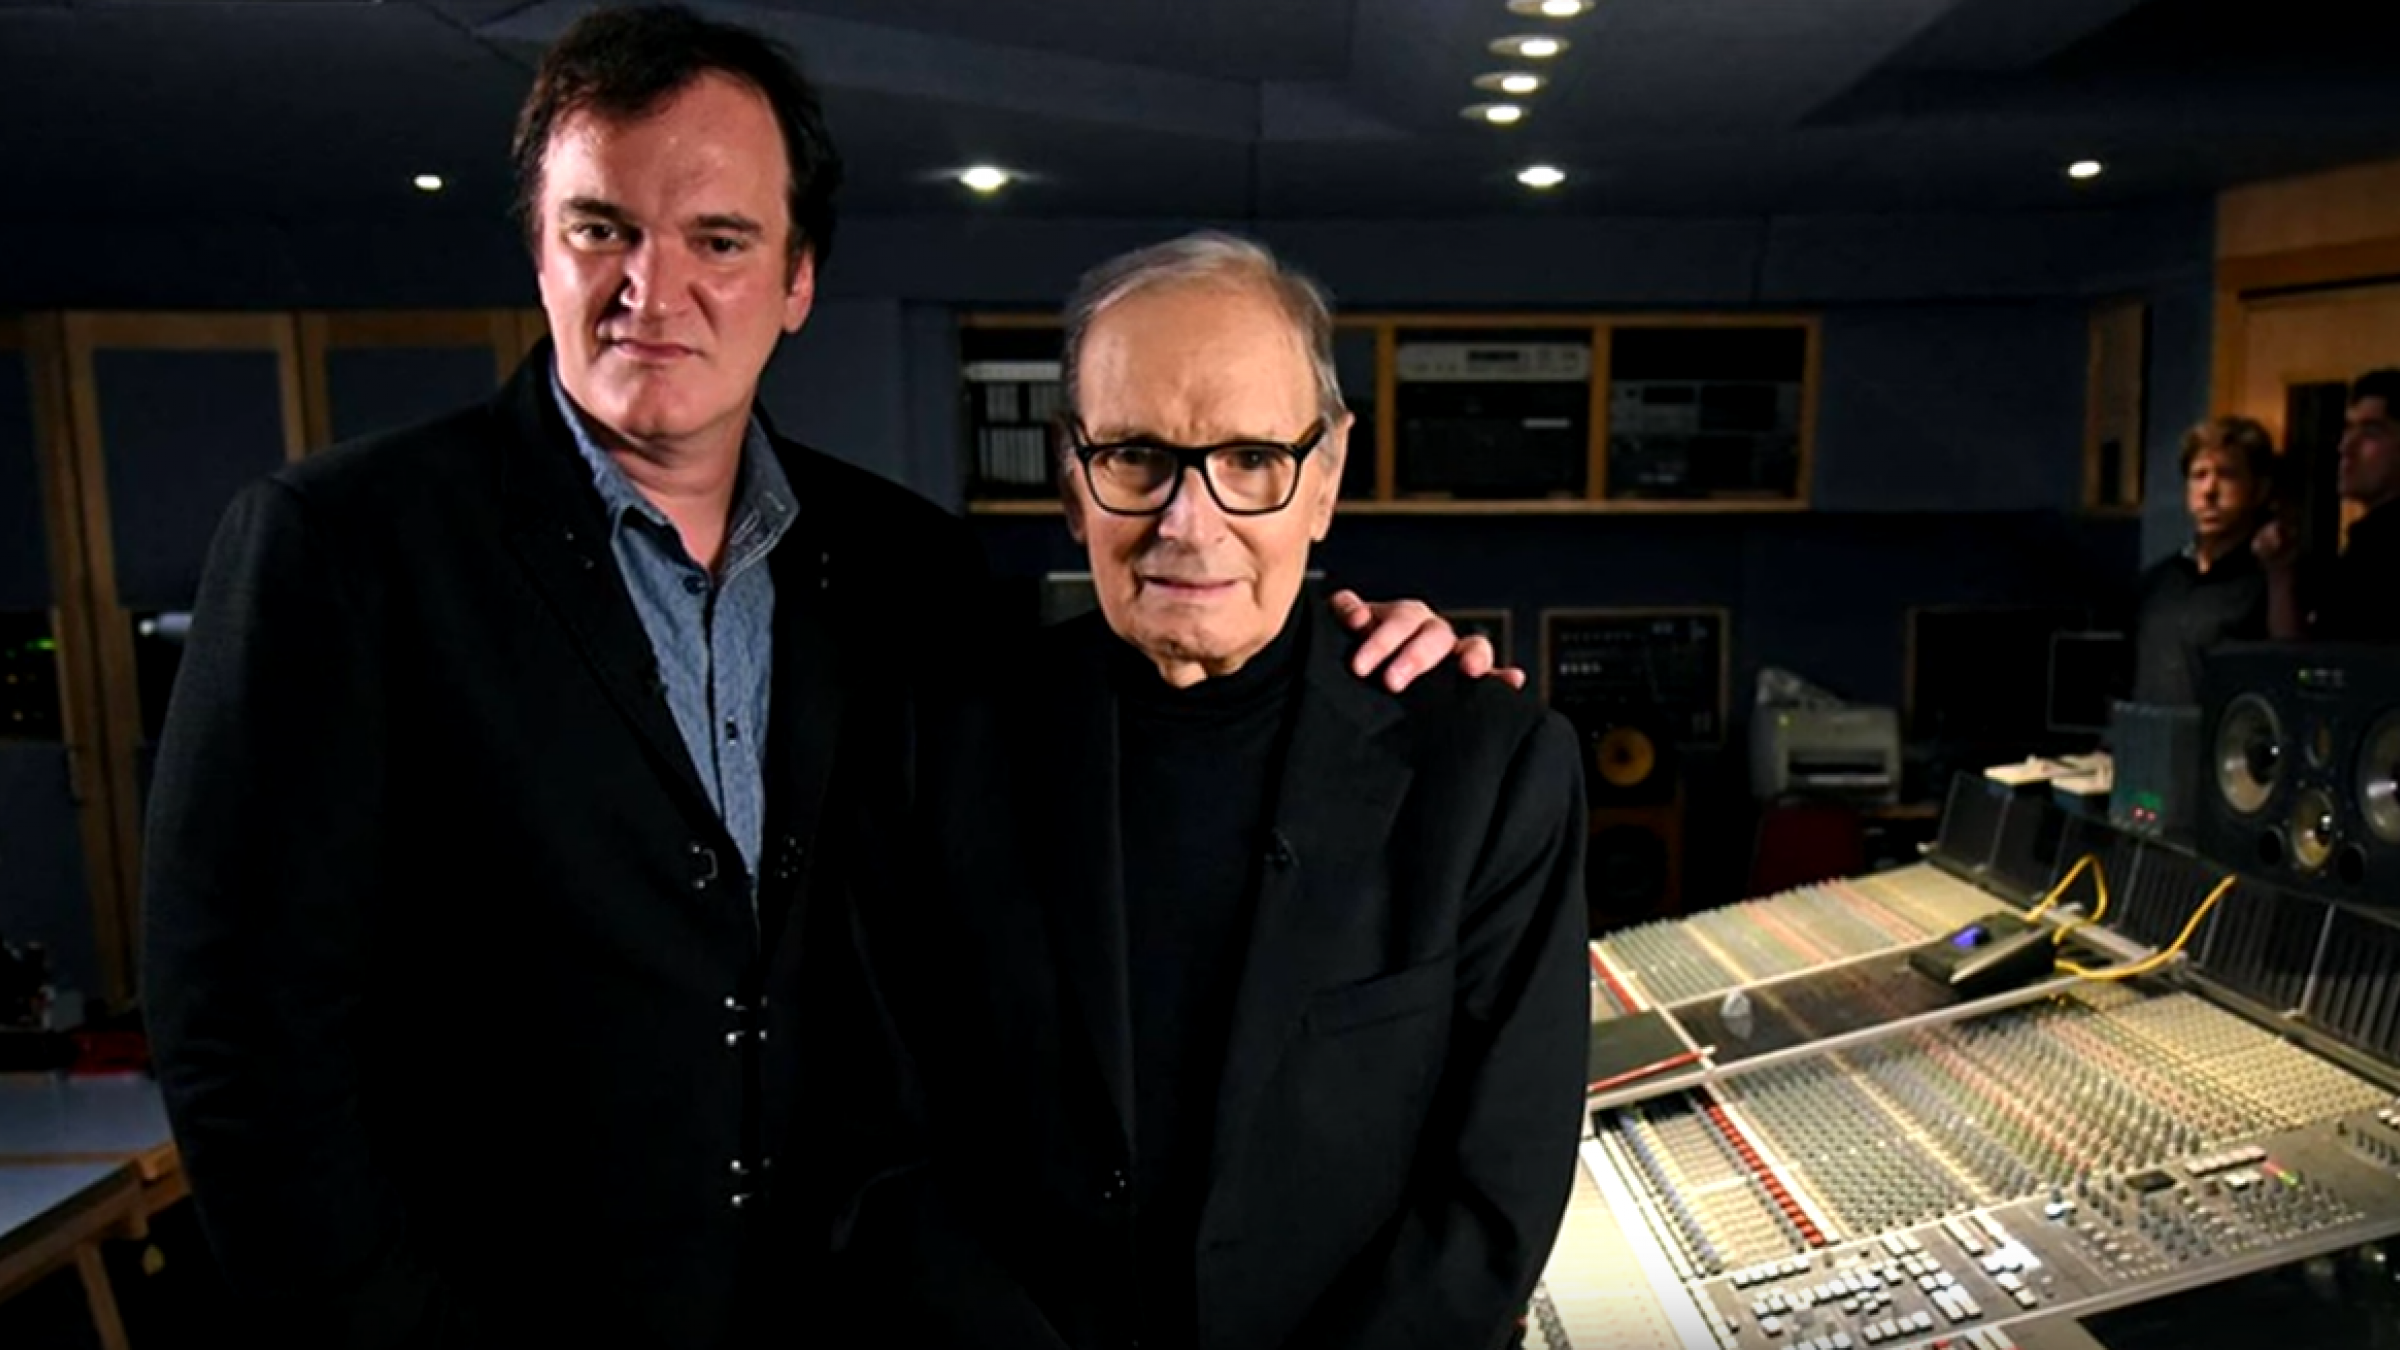 Quentin Tarantino et Ennio Morricone